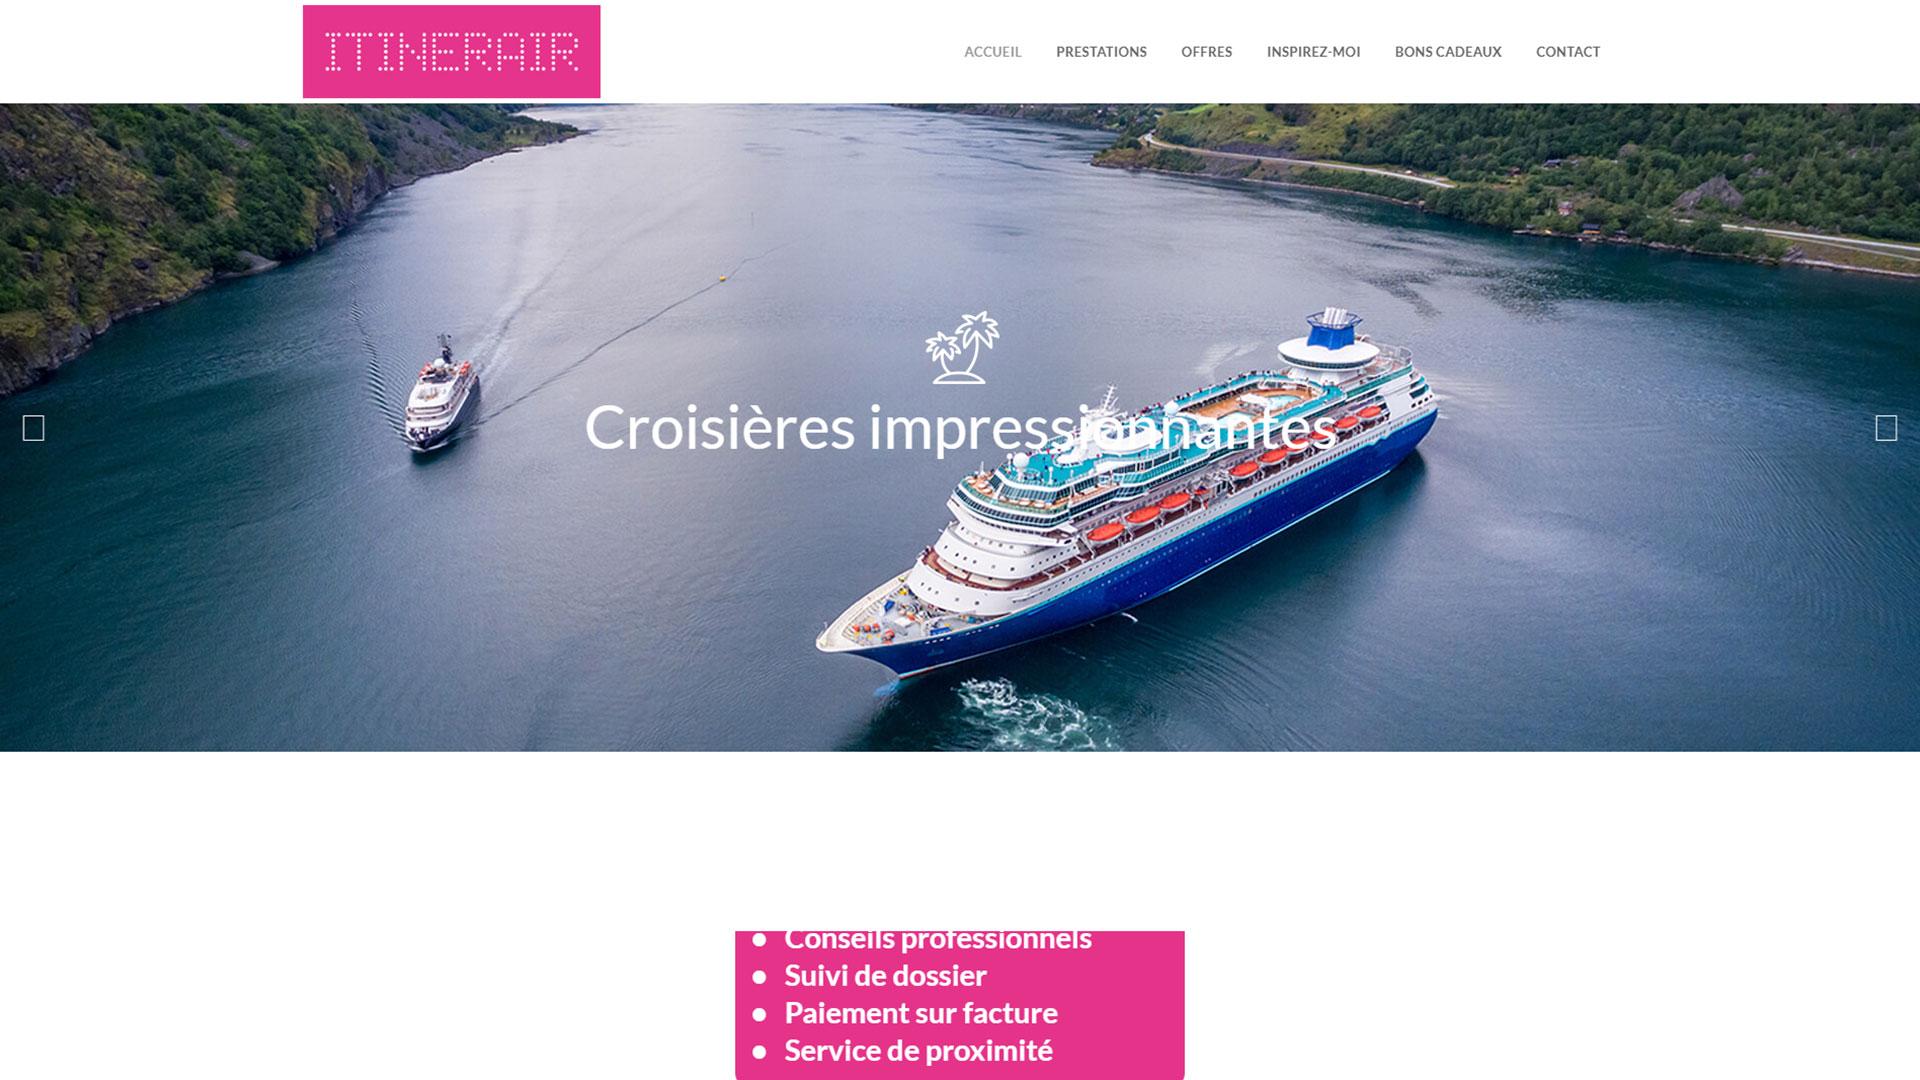 Accueil-itineraire